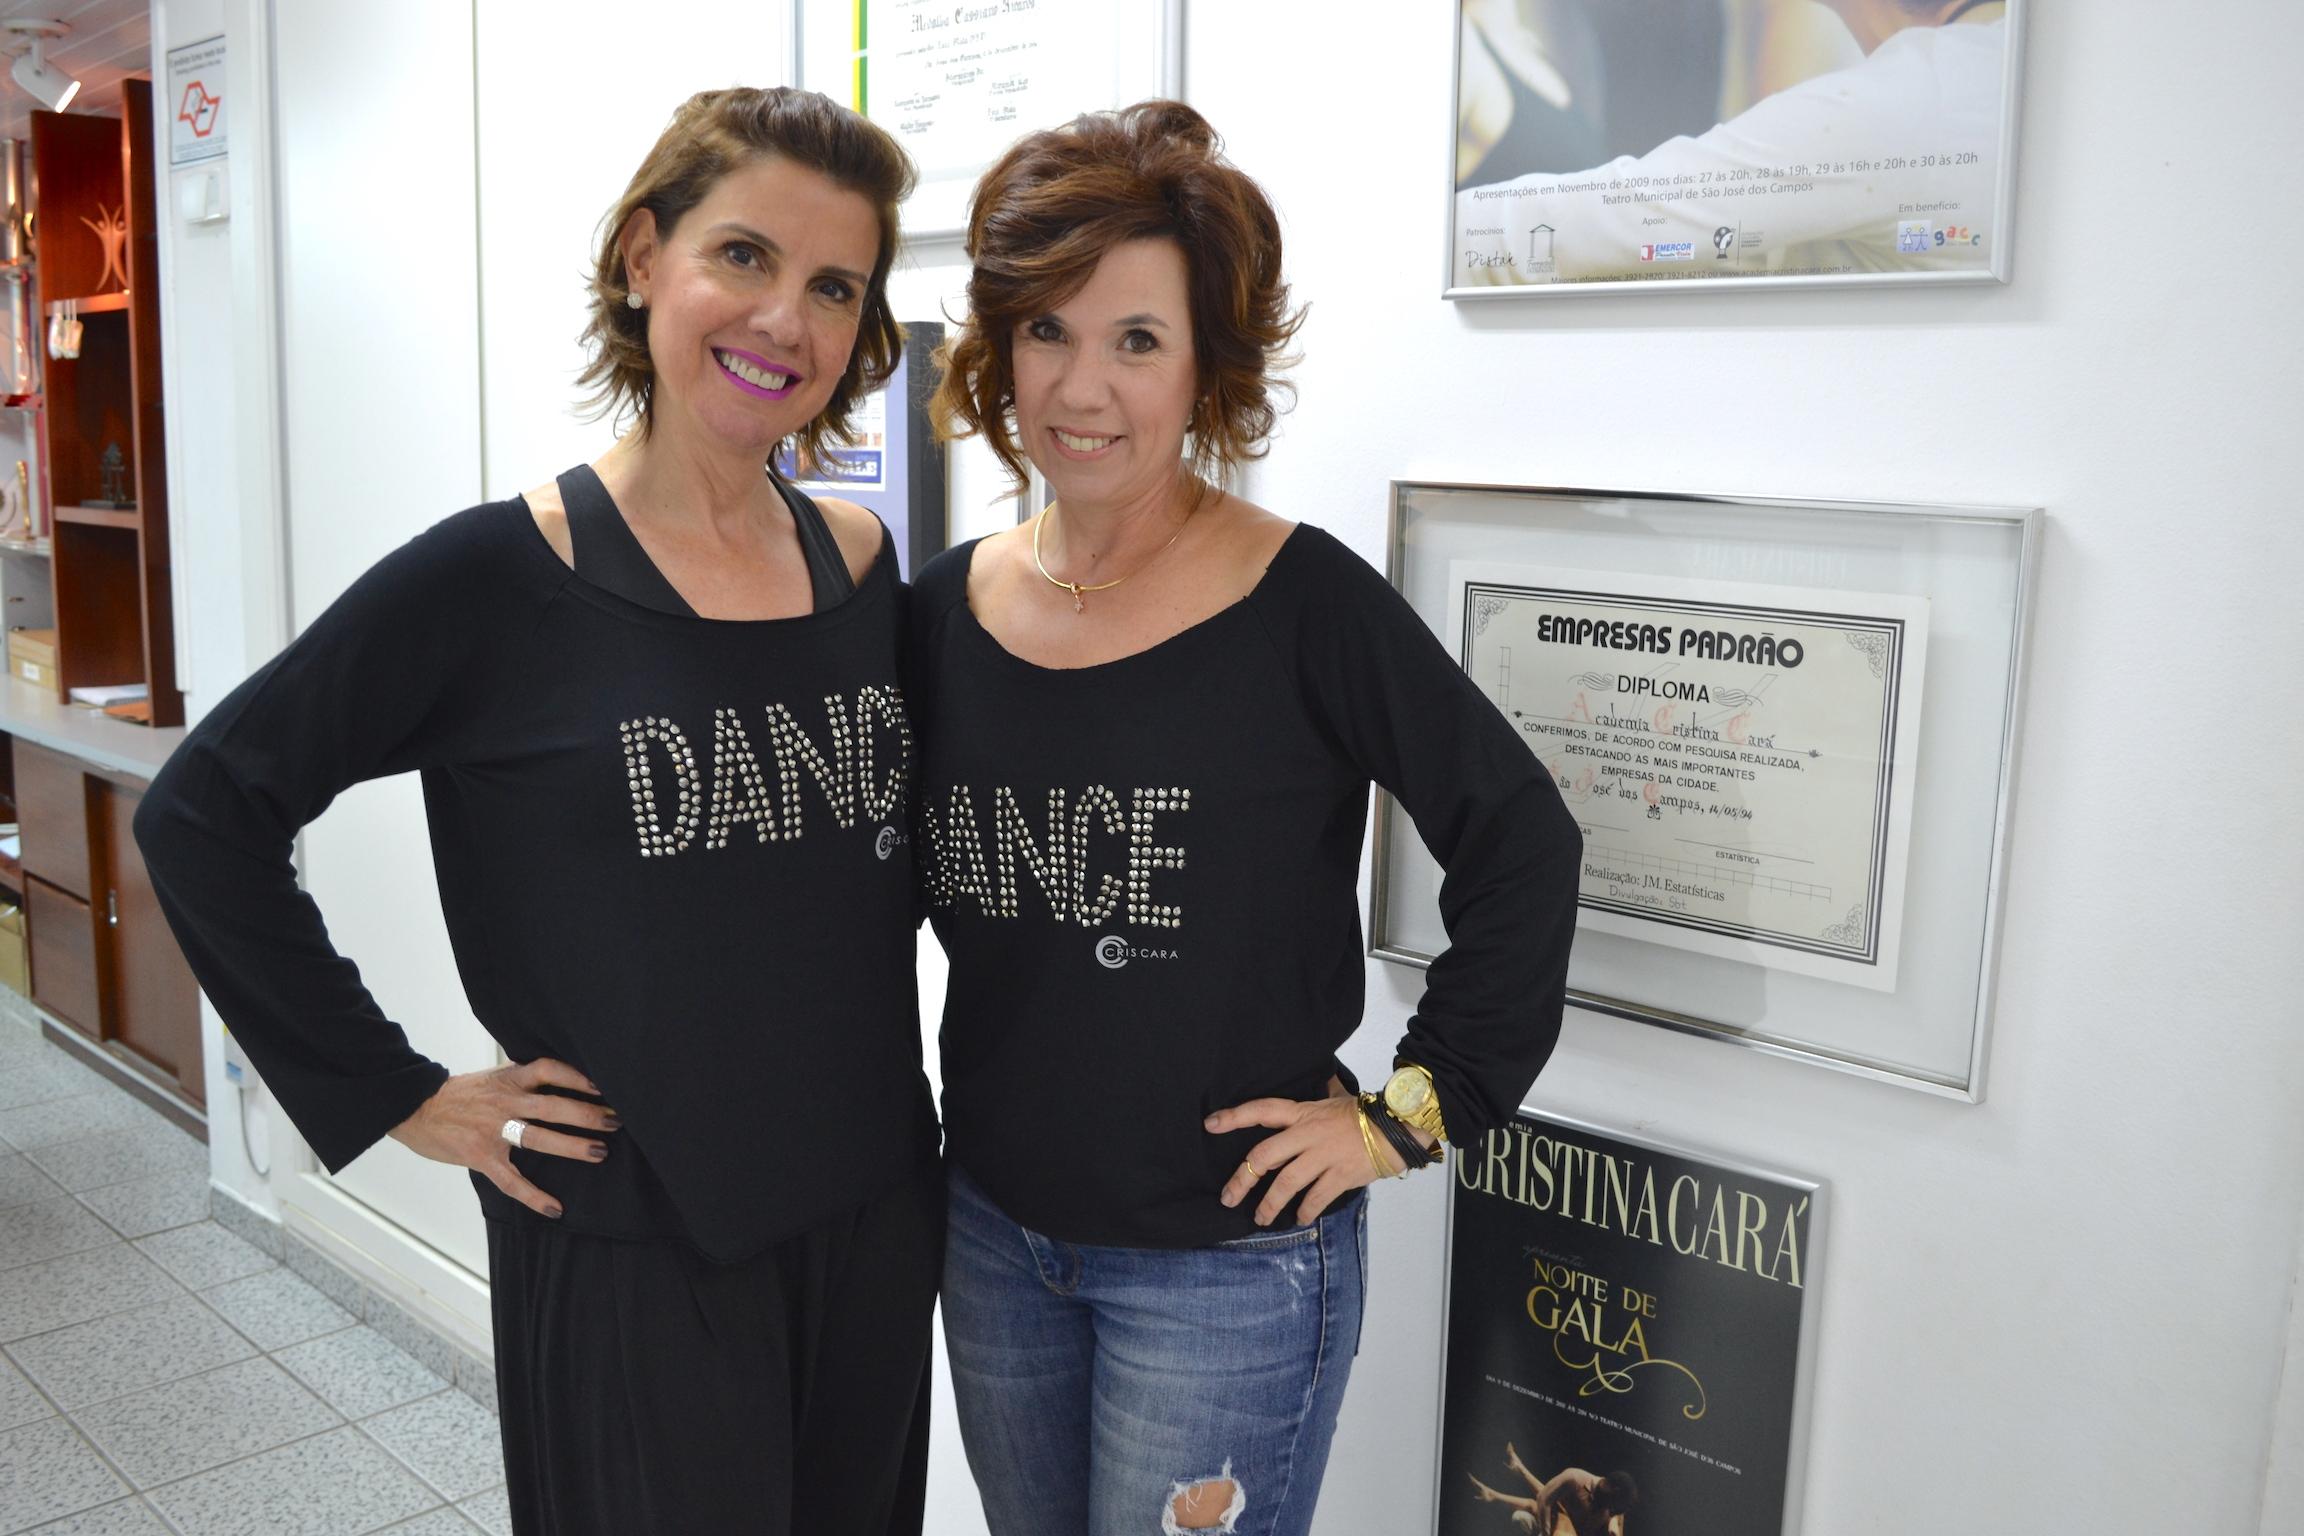 Cristina Cará e Andrea Prianti